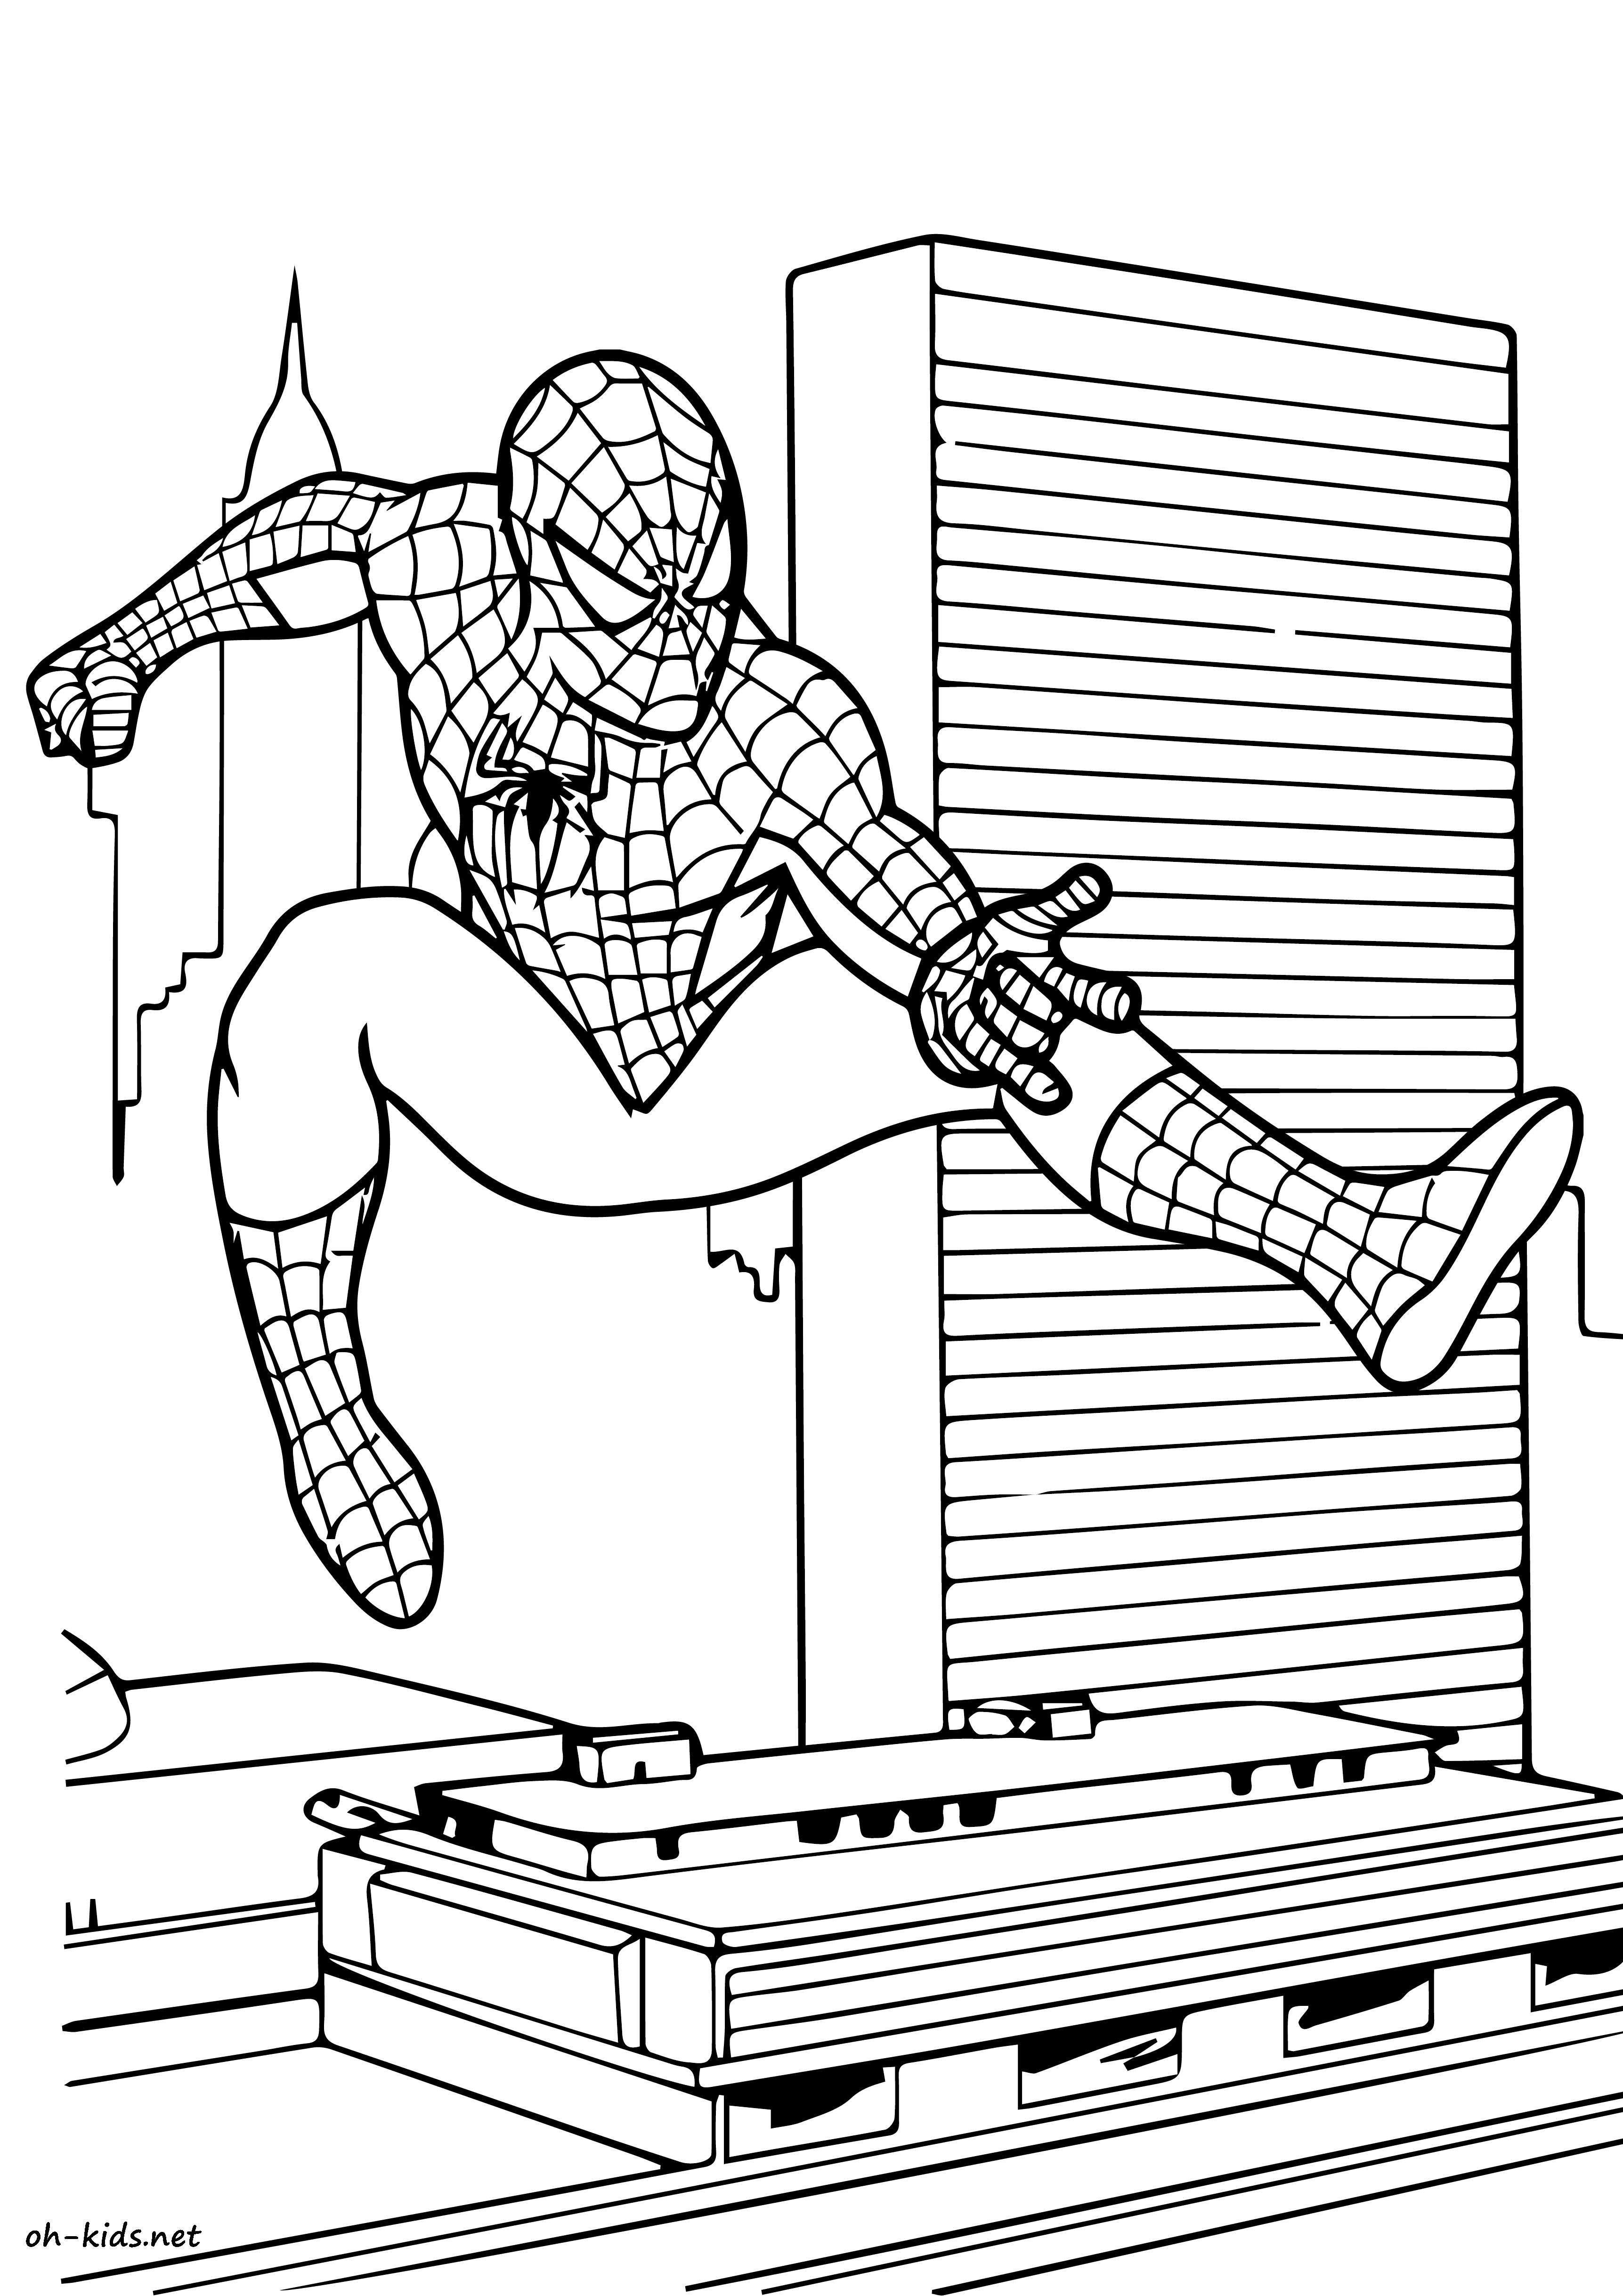 Dessin 834 Coloriage Spiderman A Imprimer Oh Kids Net